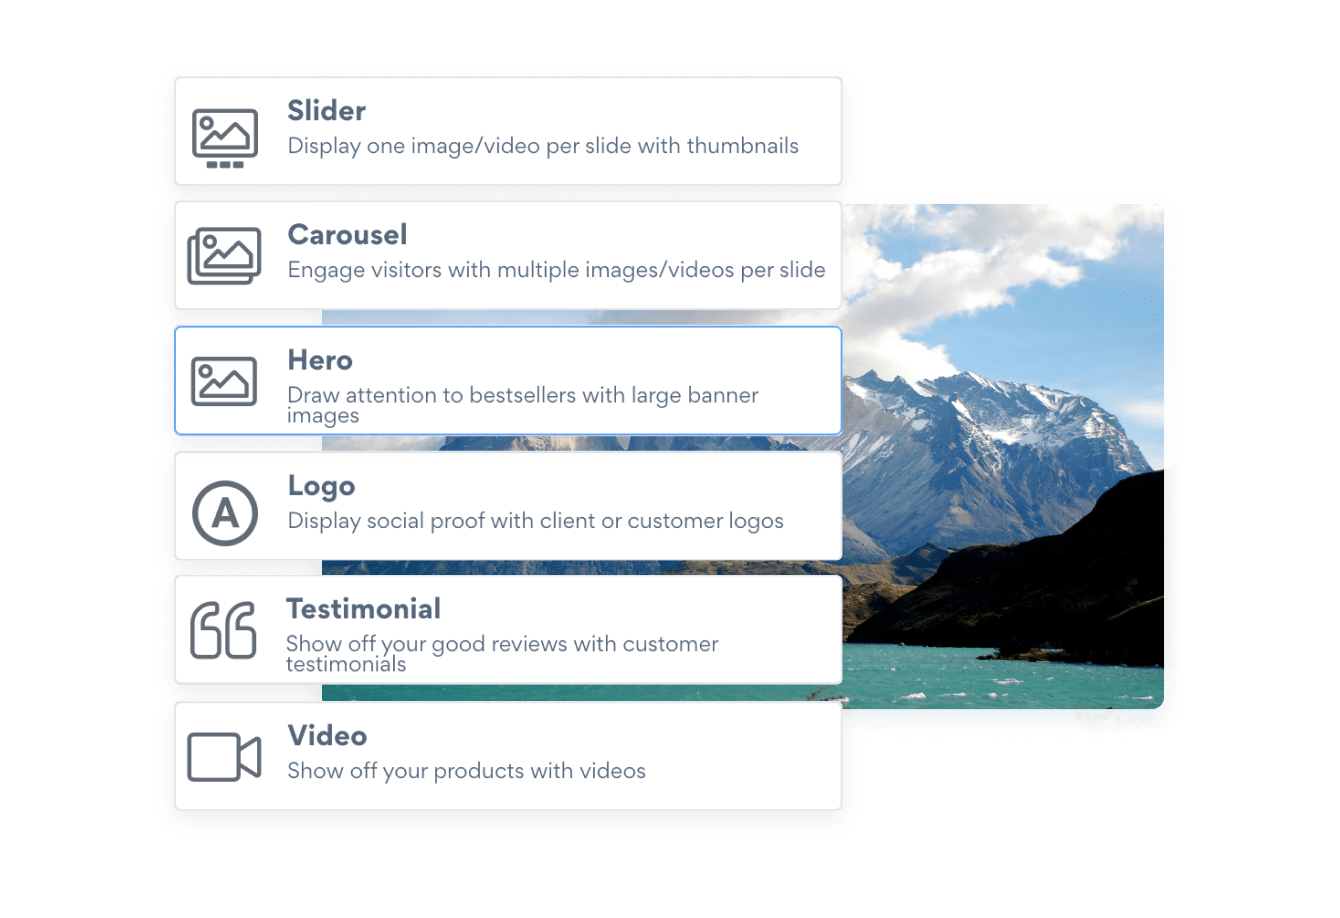 Slider templates include a carousel slideshow, hero image slider, testimonial slider and video slideshow.